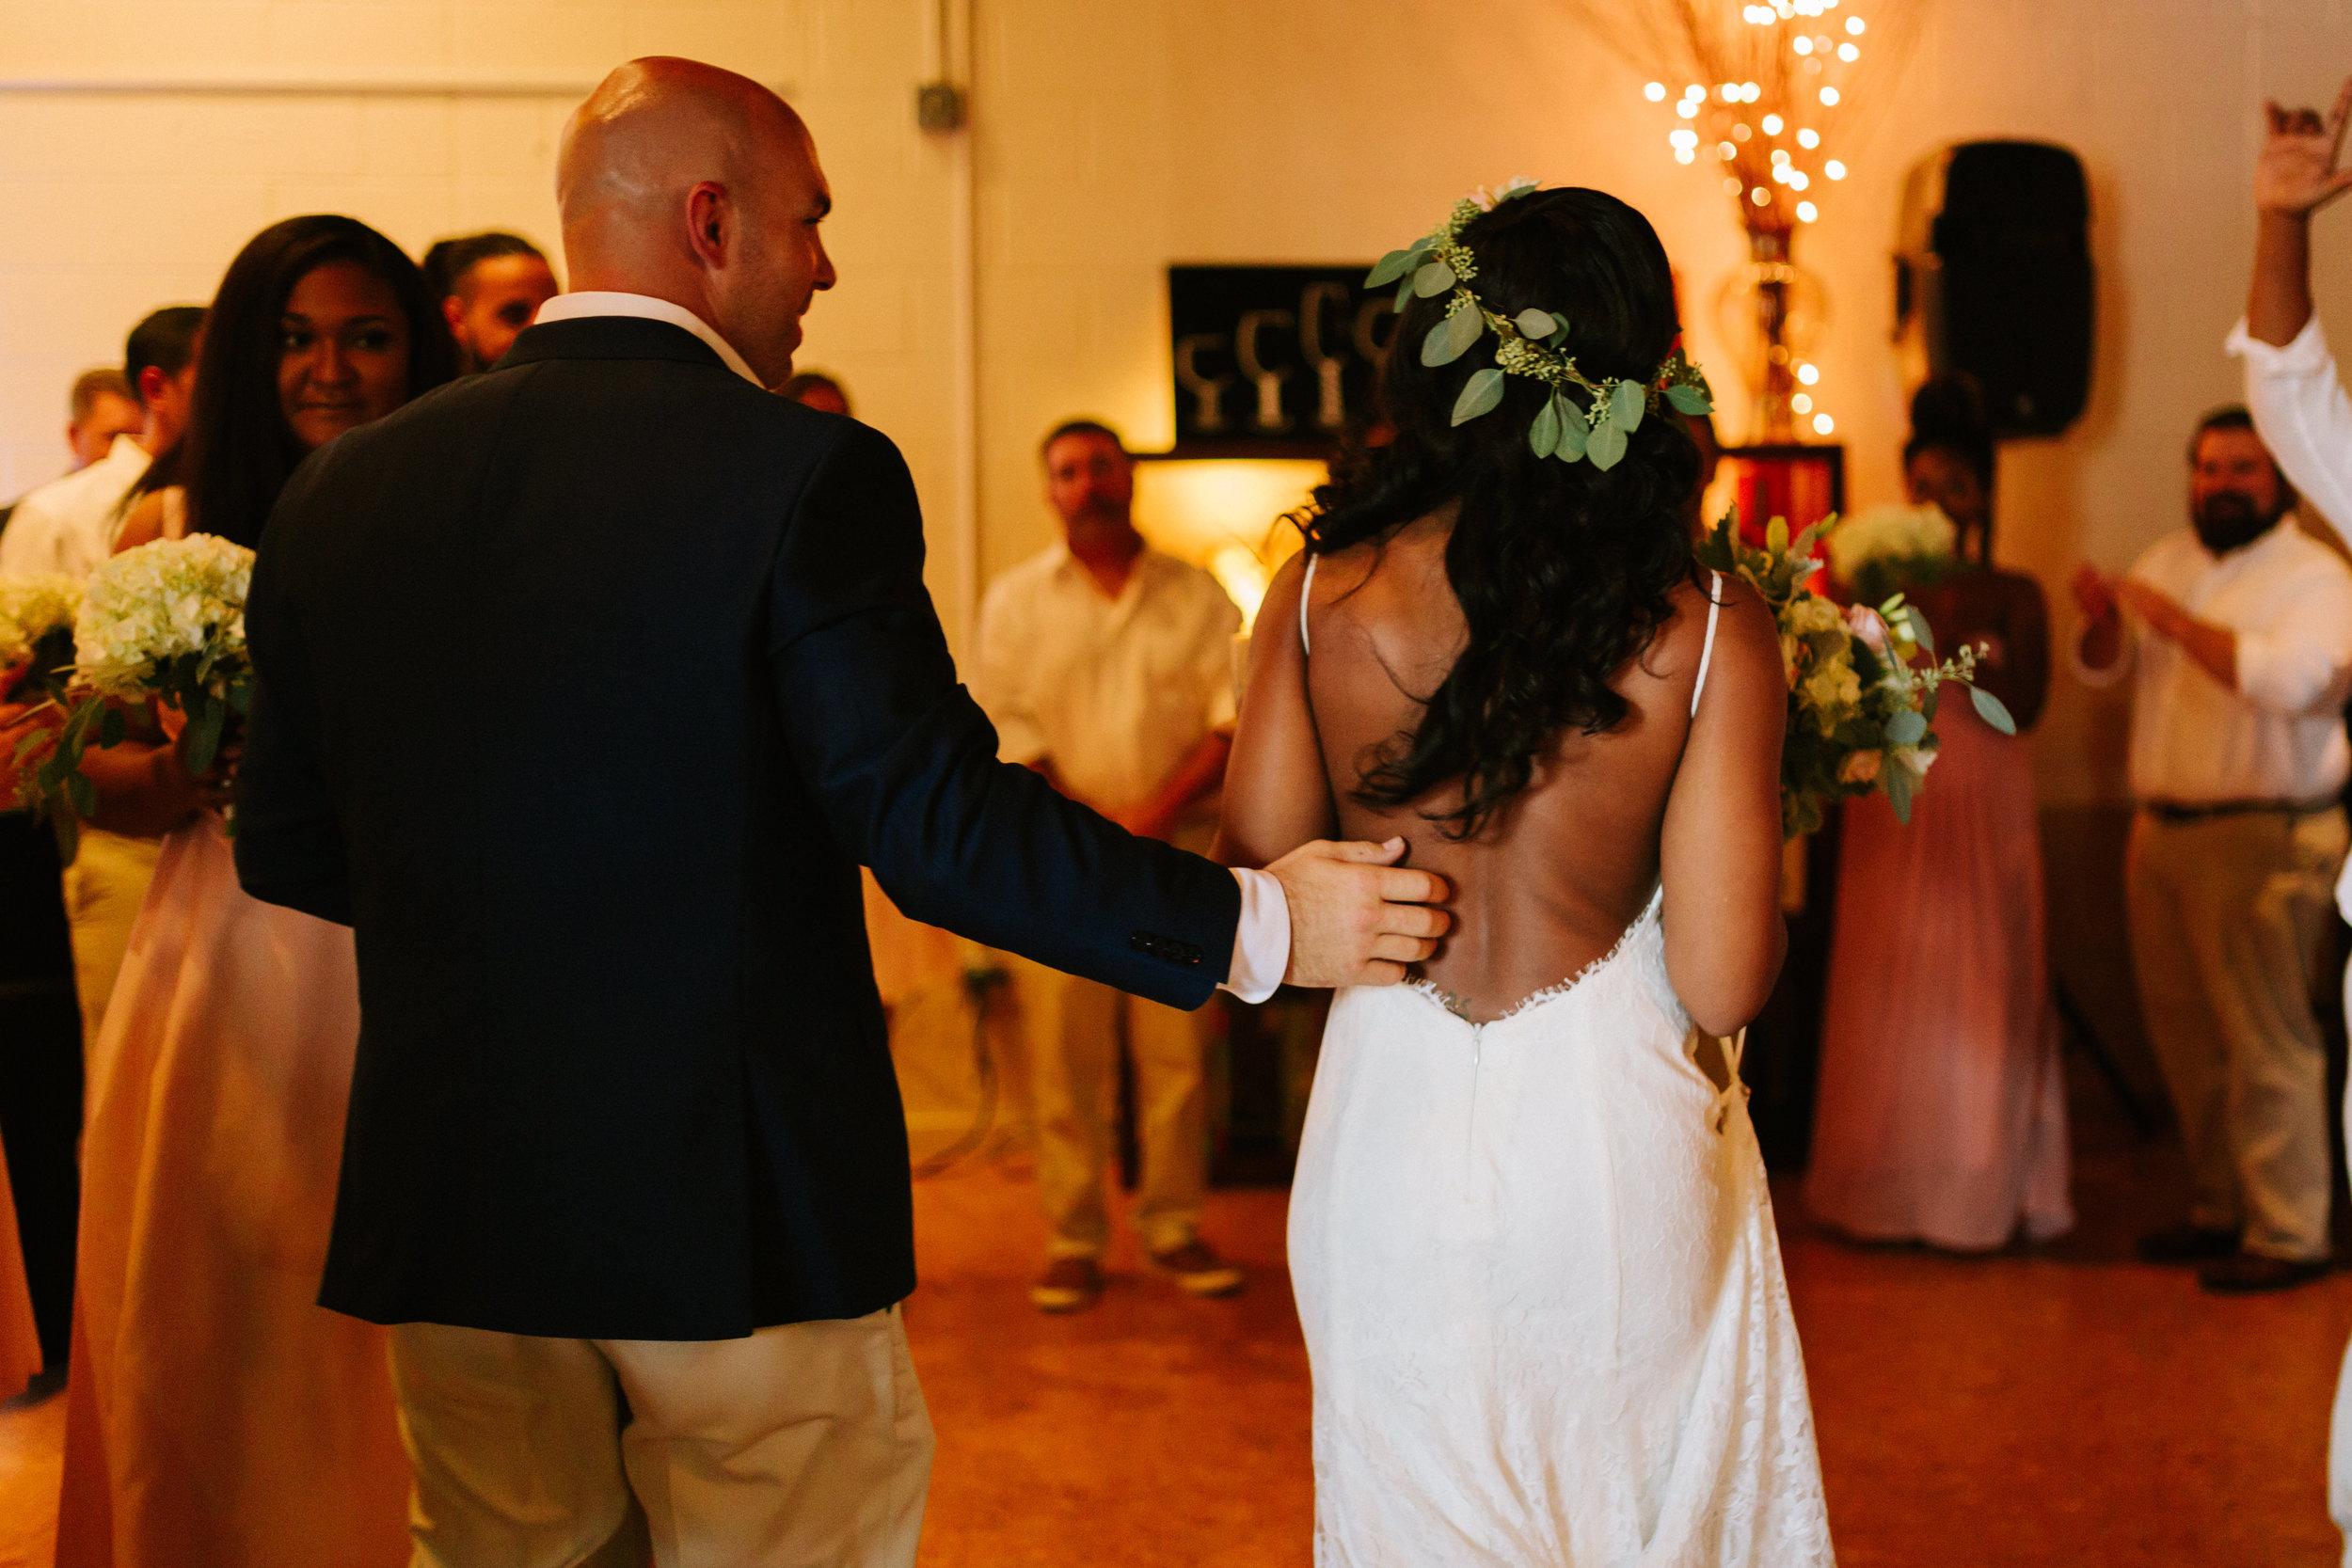 2017.09.16 Ashley and Chuck O'Day Quantam Leap Winery Wedding (300 of 462).jpg